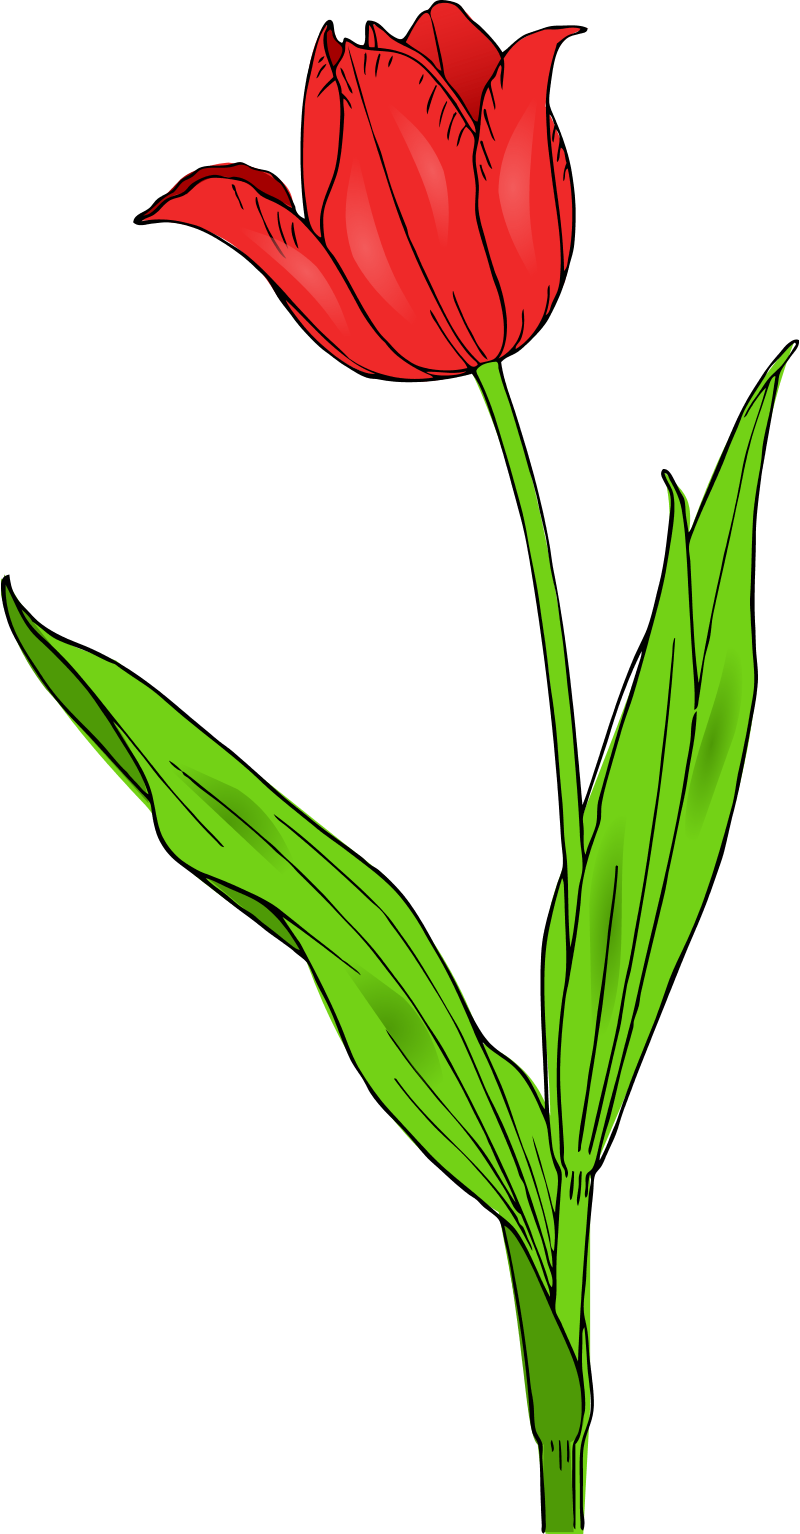 Spring Flowers Clip Art-Spring Flowers Clip Art-18